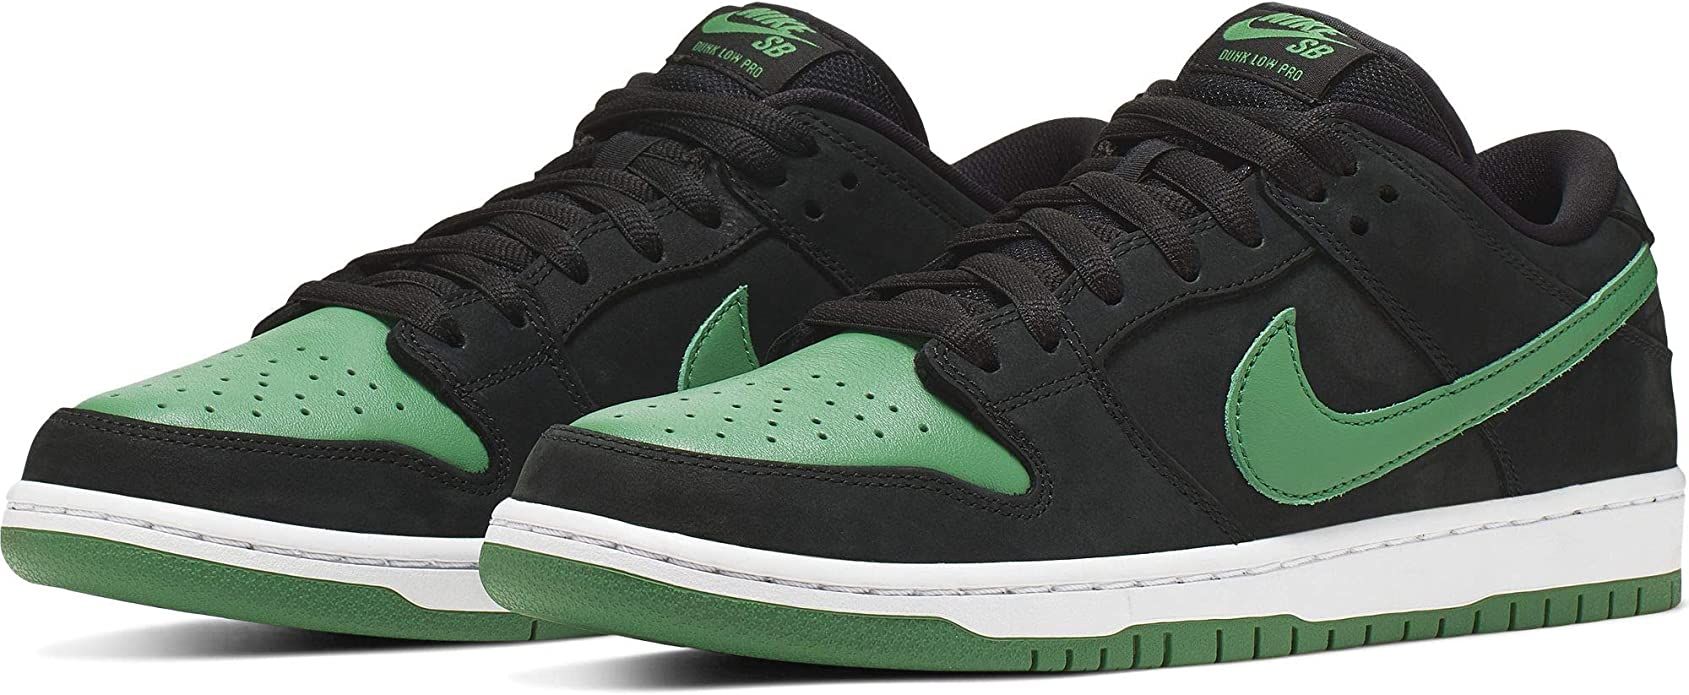 Nike SB Dunk Low Pro Men's Shoes